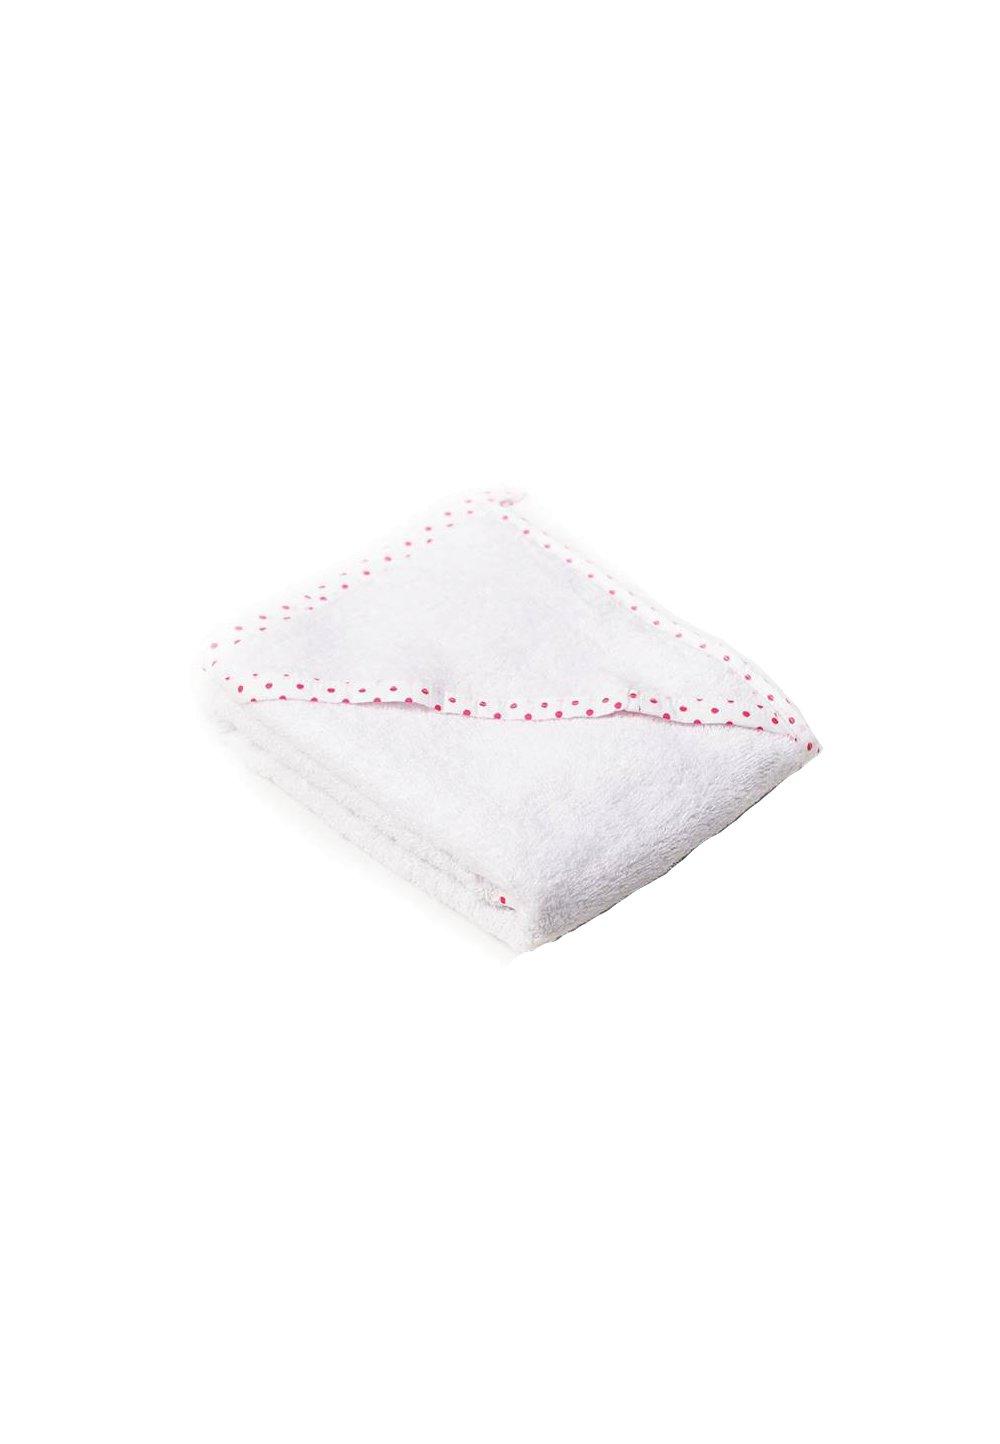 Prosop bumbac, alb, buline roz, 80x100cm imagine